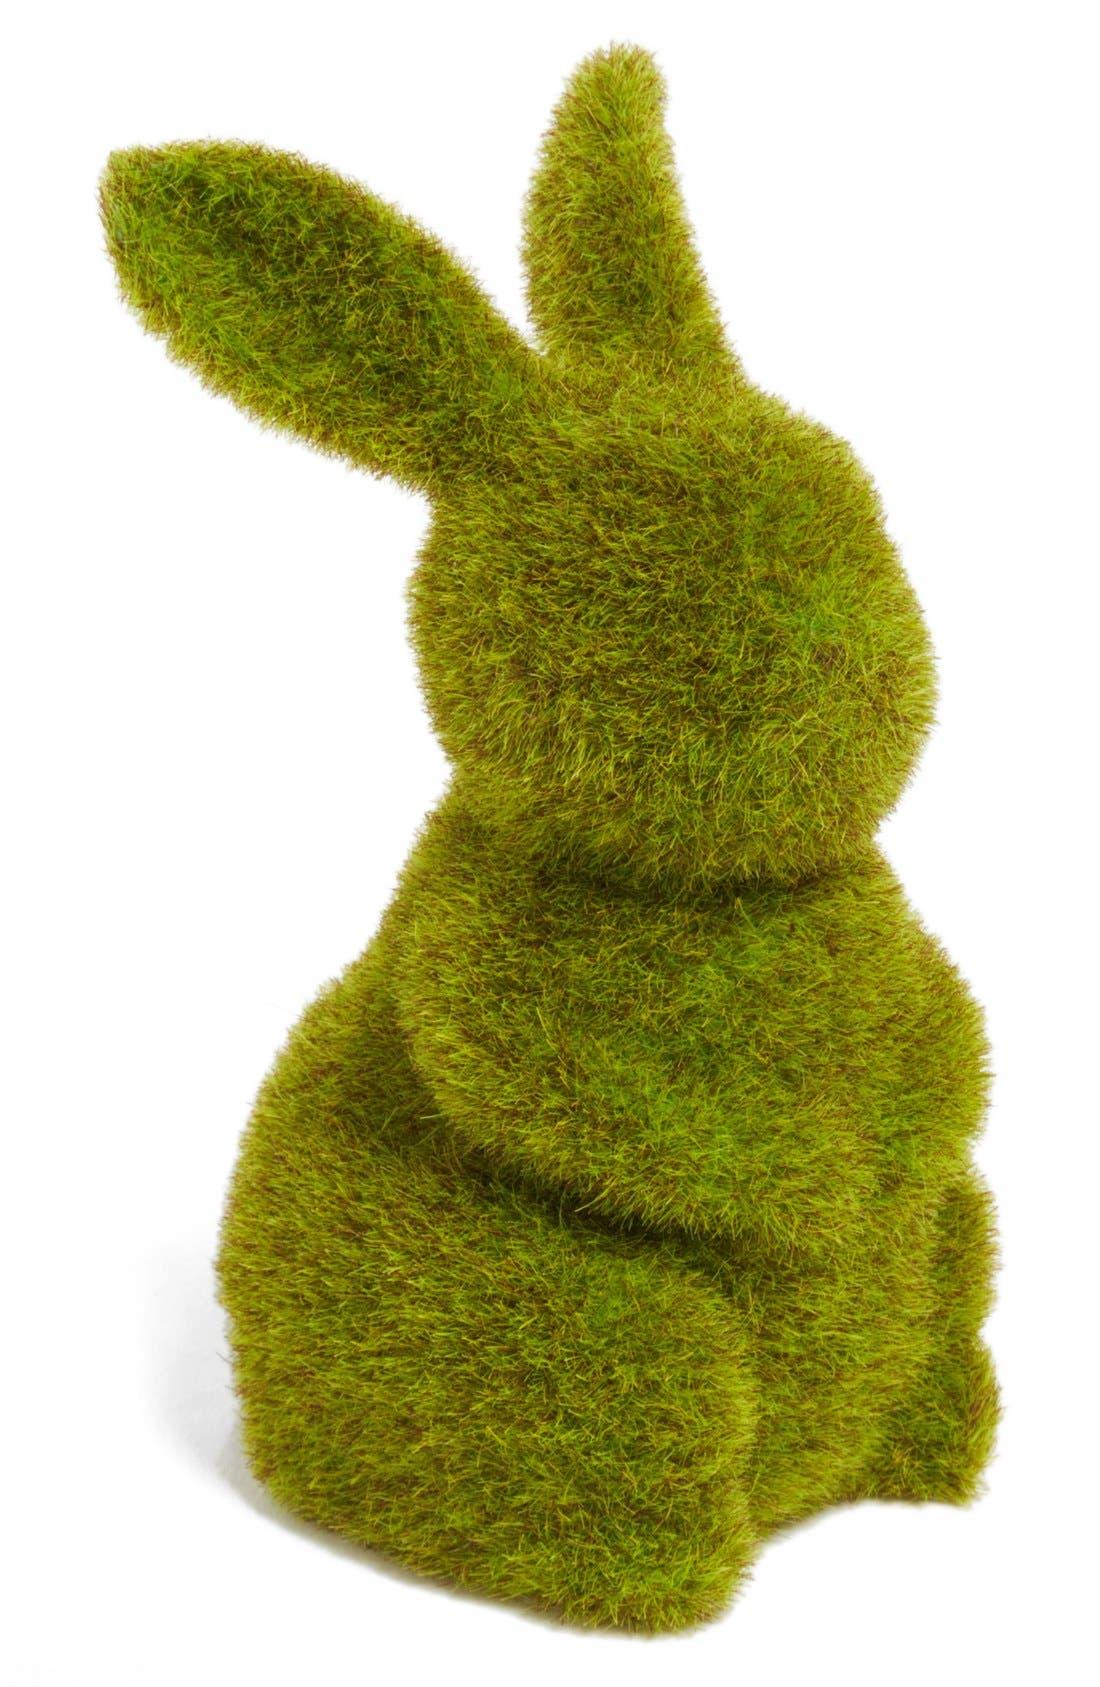 Main Image - ALLSTATE 'Moss Bunny' Figurine